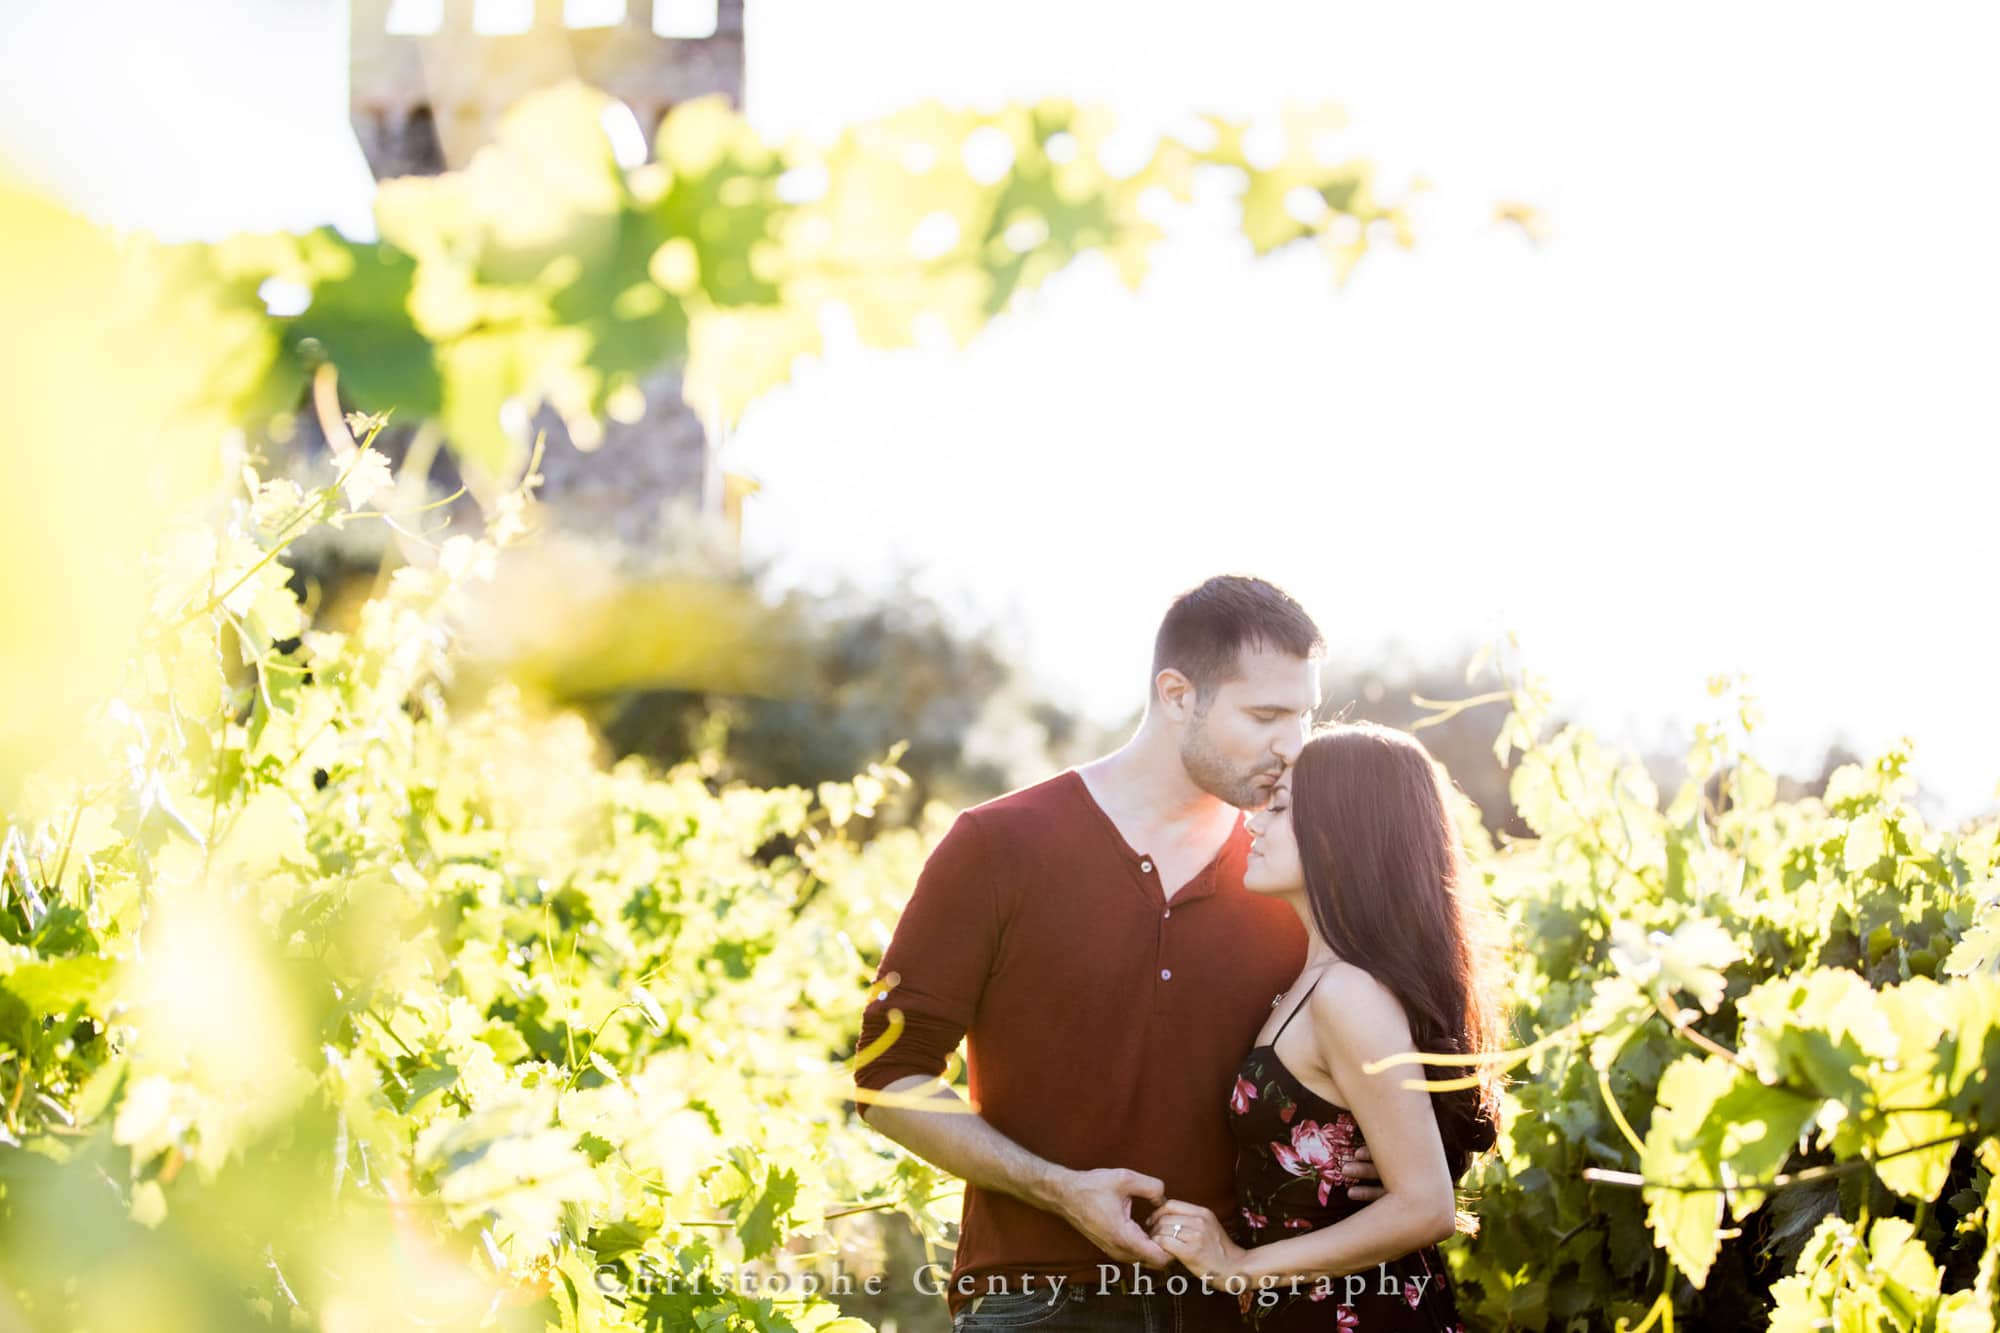 Castello di Amorosa Marriage Proposal Photography 375